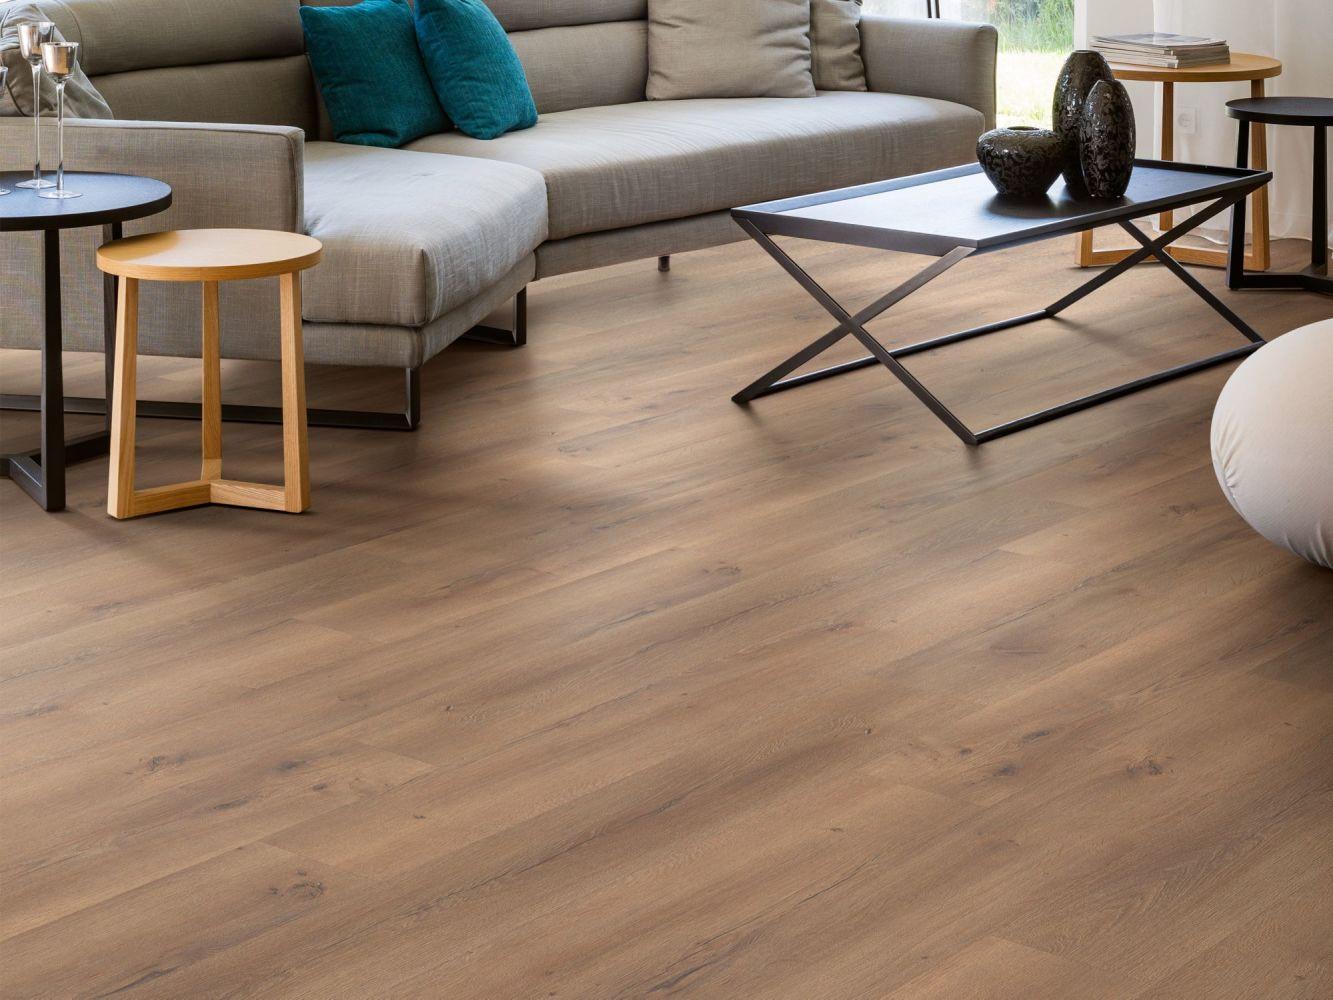 Shaw Floors Versalock Laminate Cadence Expressive Brown 06006_SL449